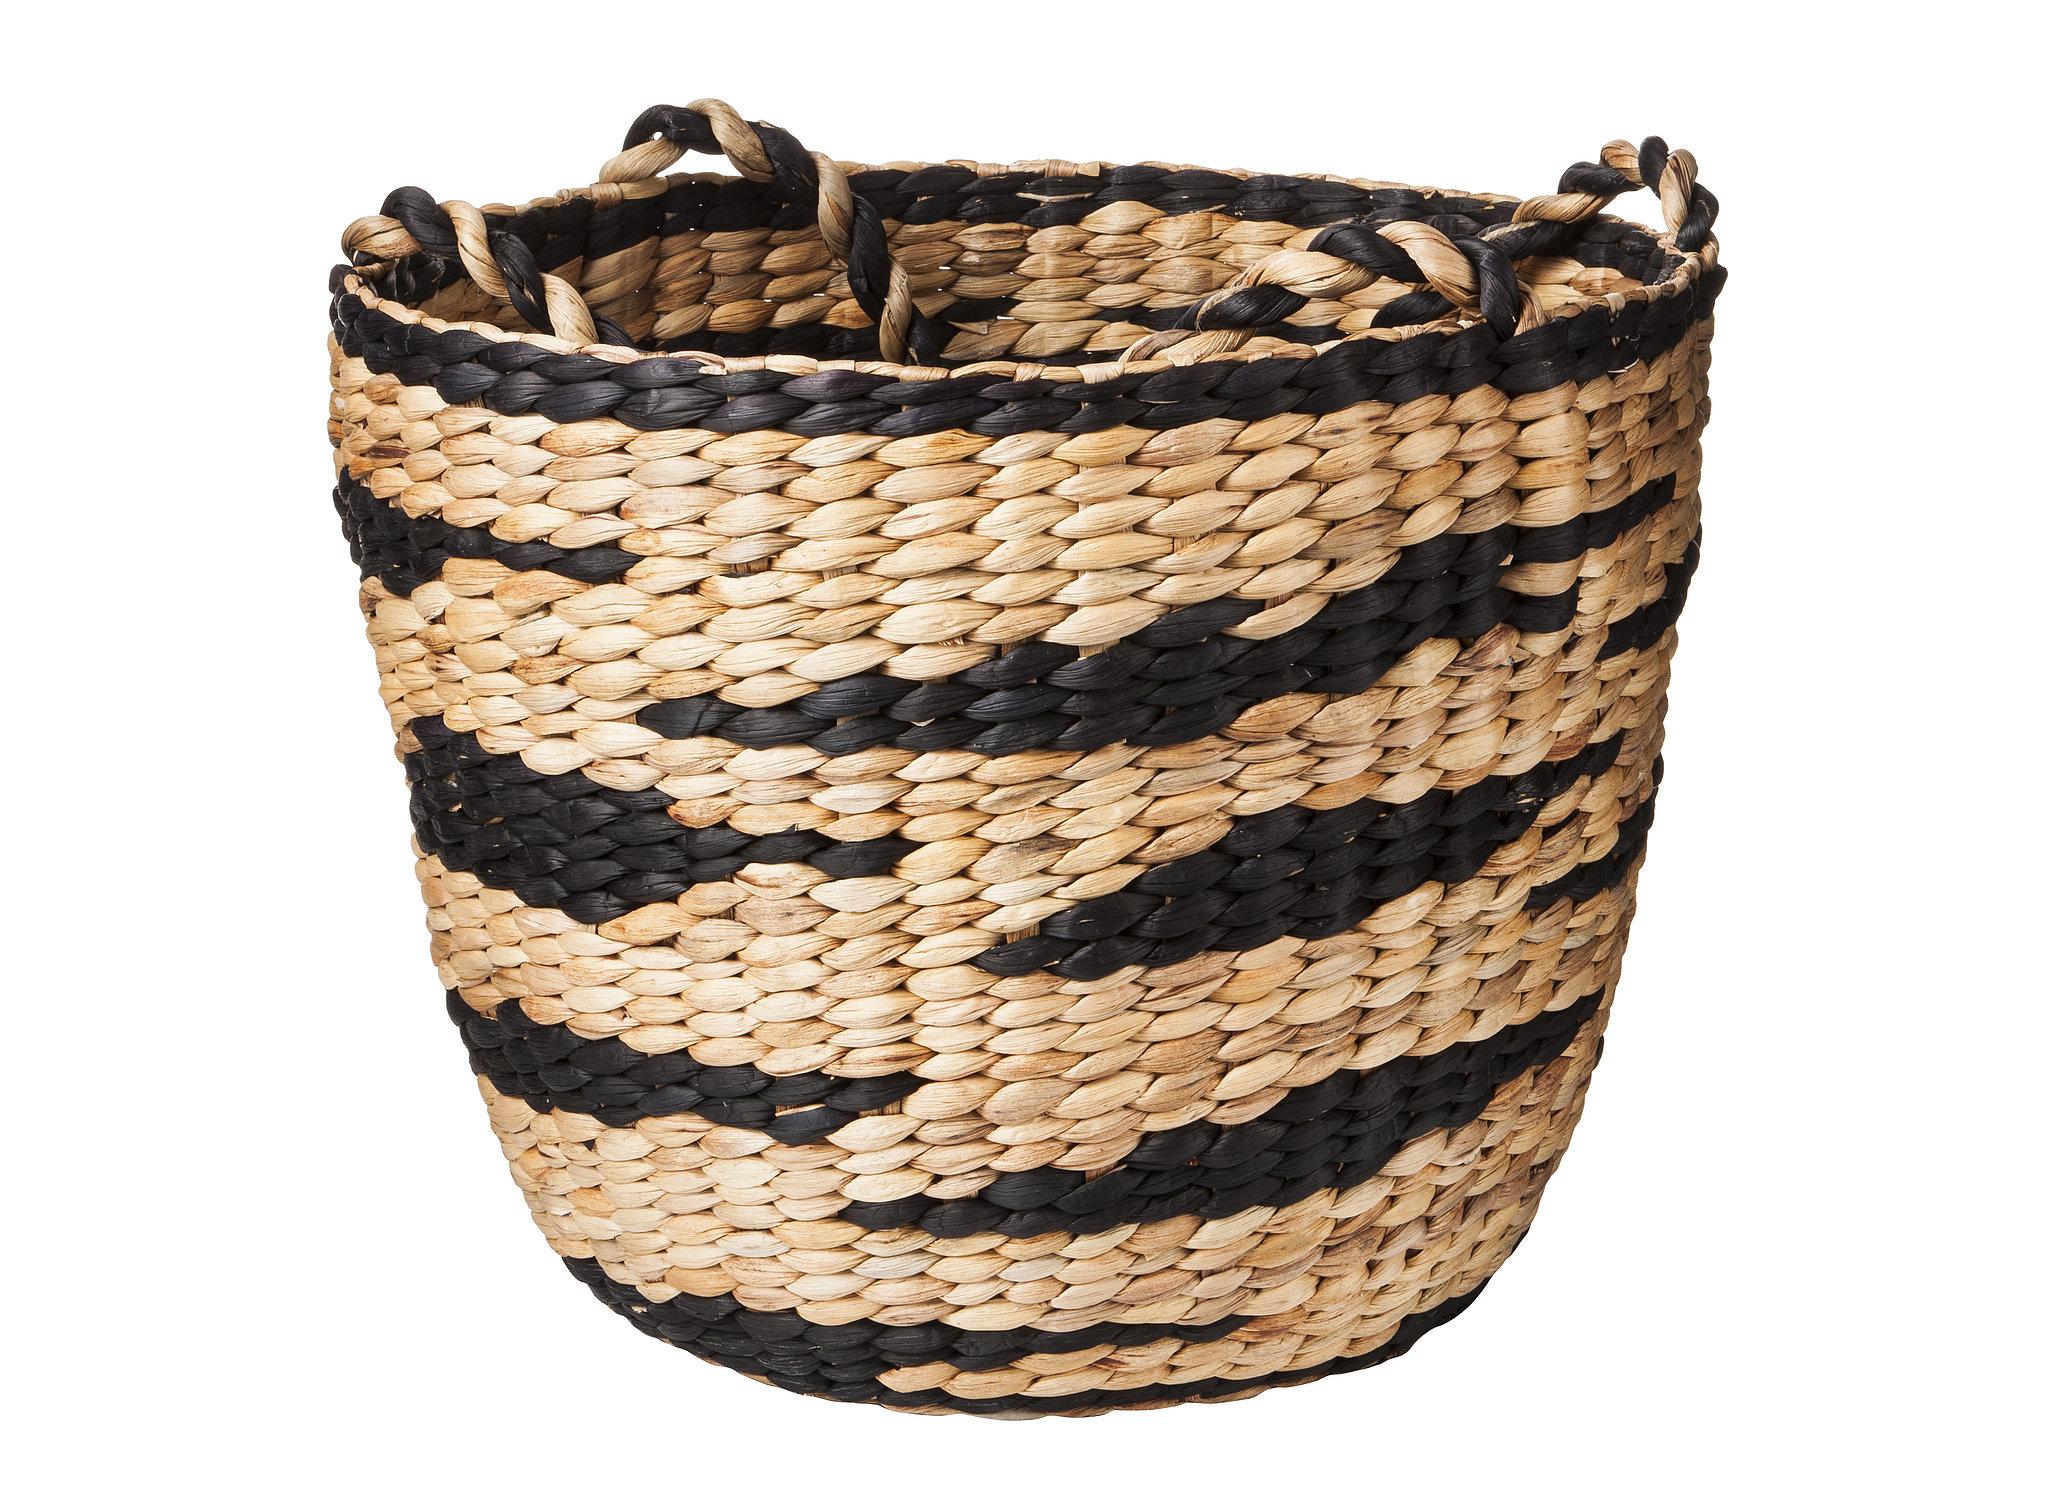 Water Hyacinth Basket With Handles ($35)